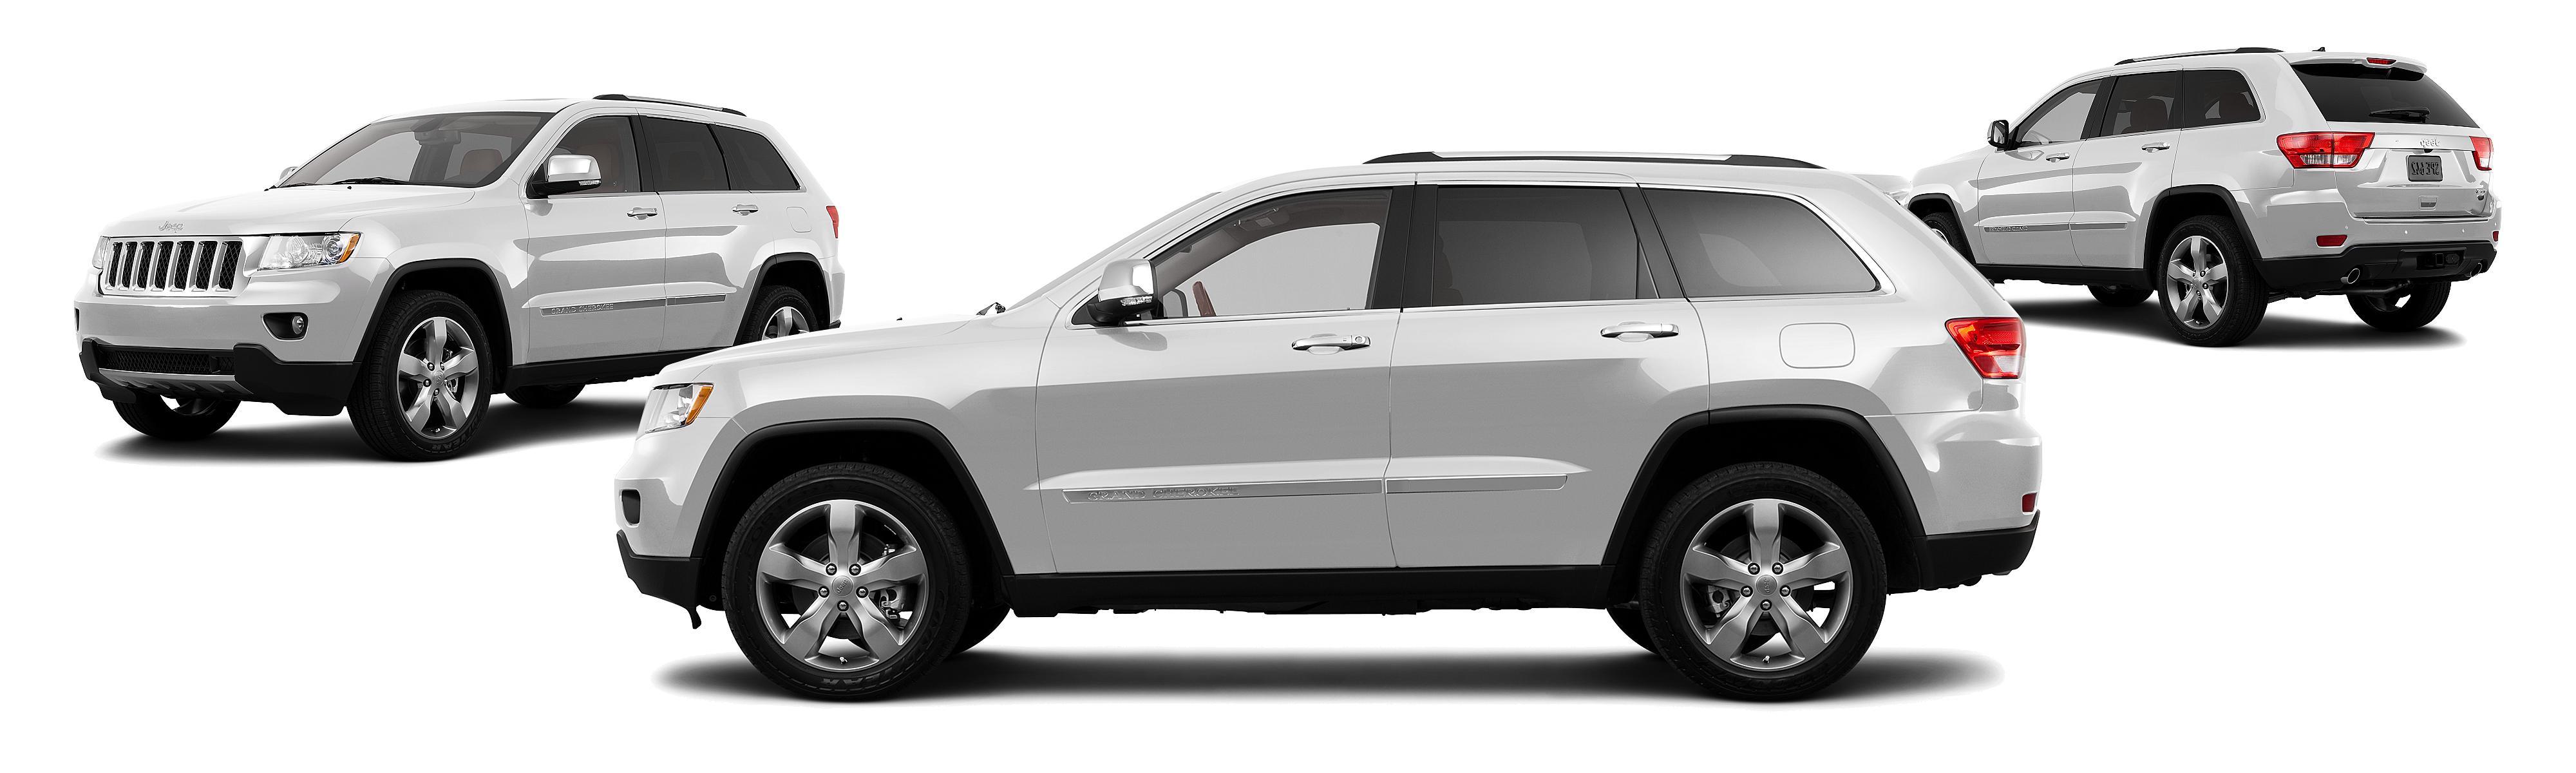 jeep ride cherokee photos info modification at specs grand markocz